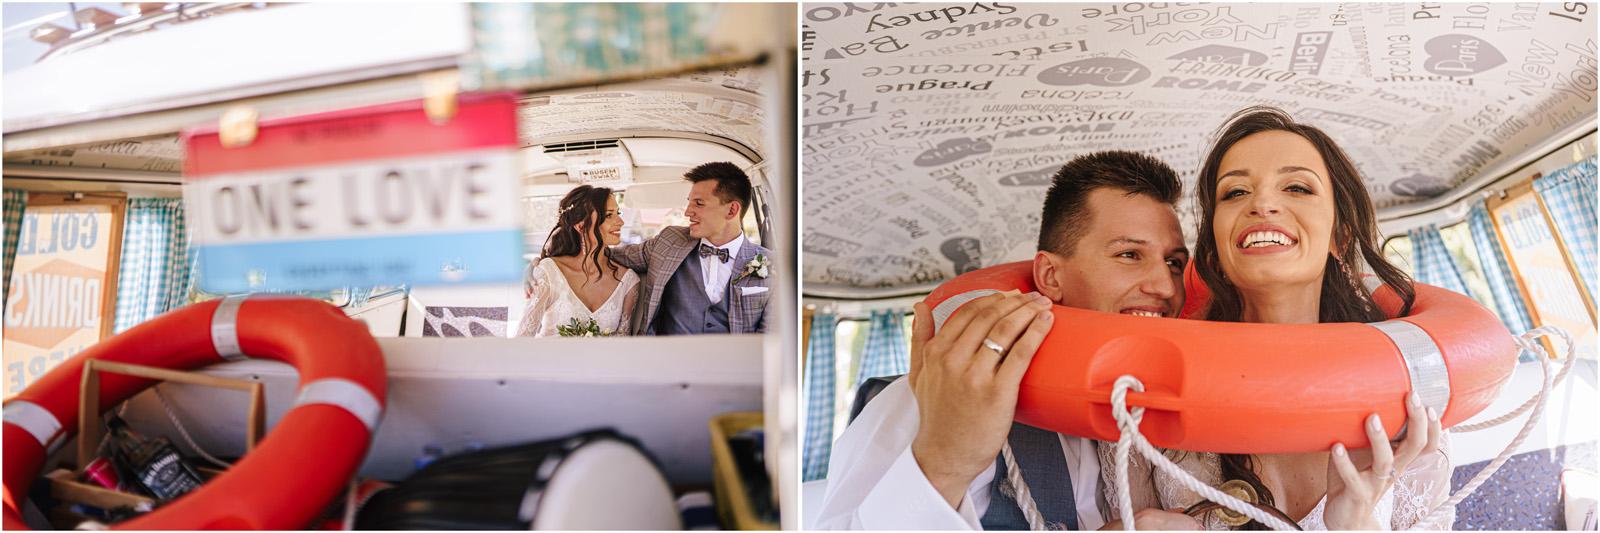 Ania & Mateusz | boho wesele w Stodole pod Kasztanami 57